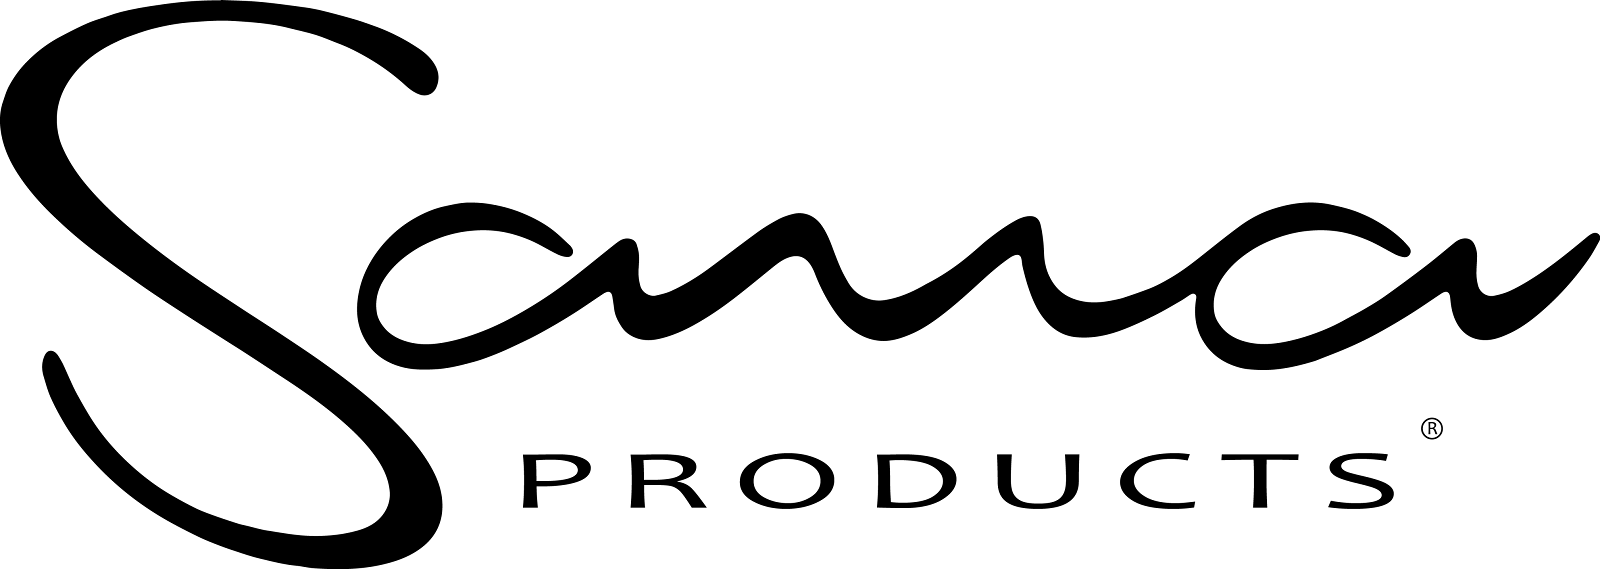 Логотип компании Sana